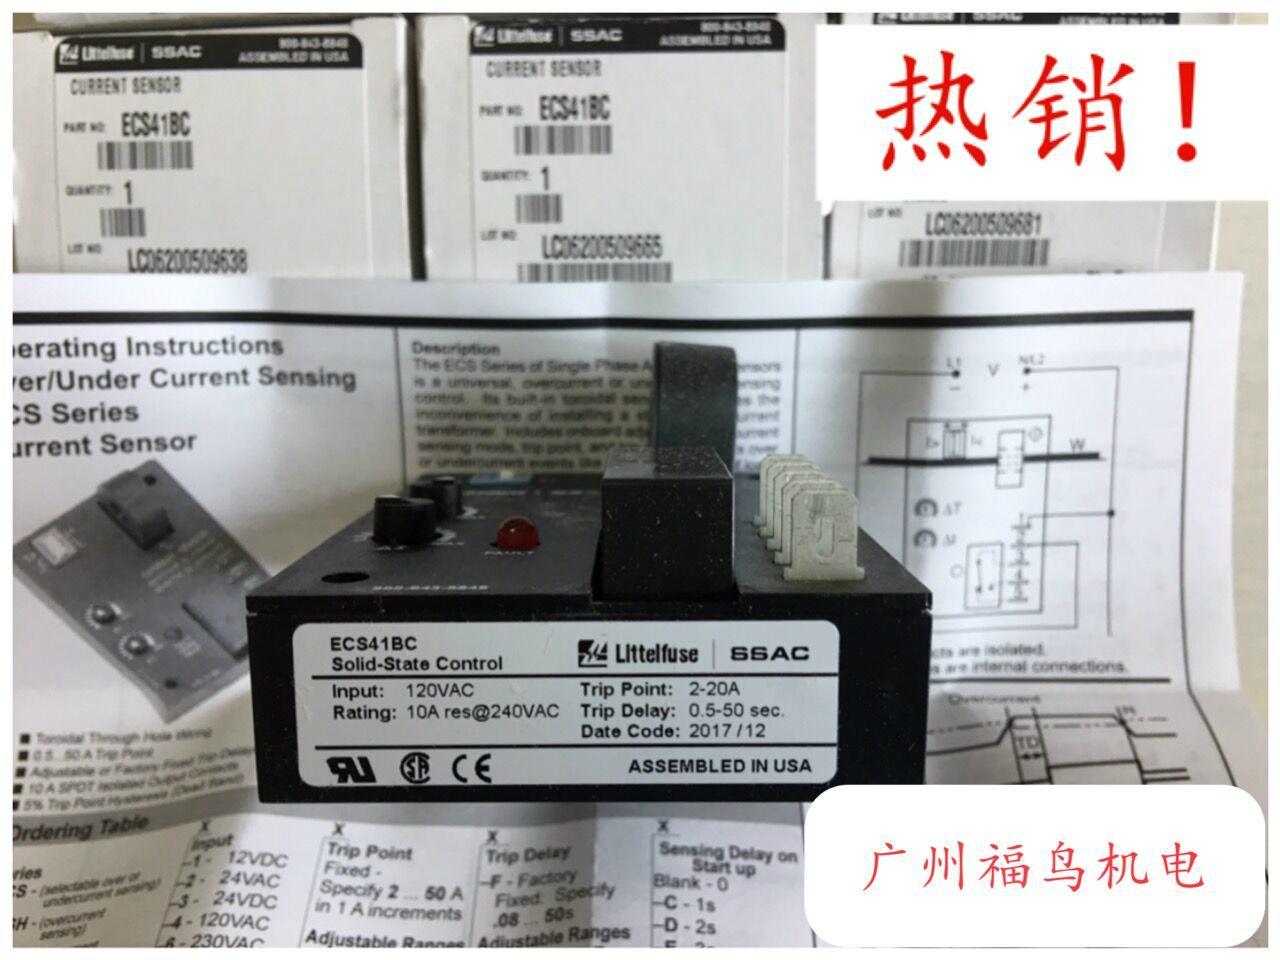 SSAC电流传感继电器, 型号: ECS41BC